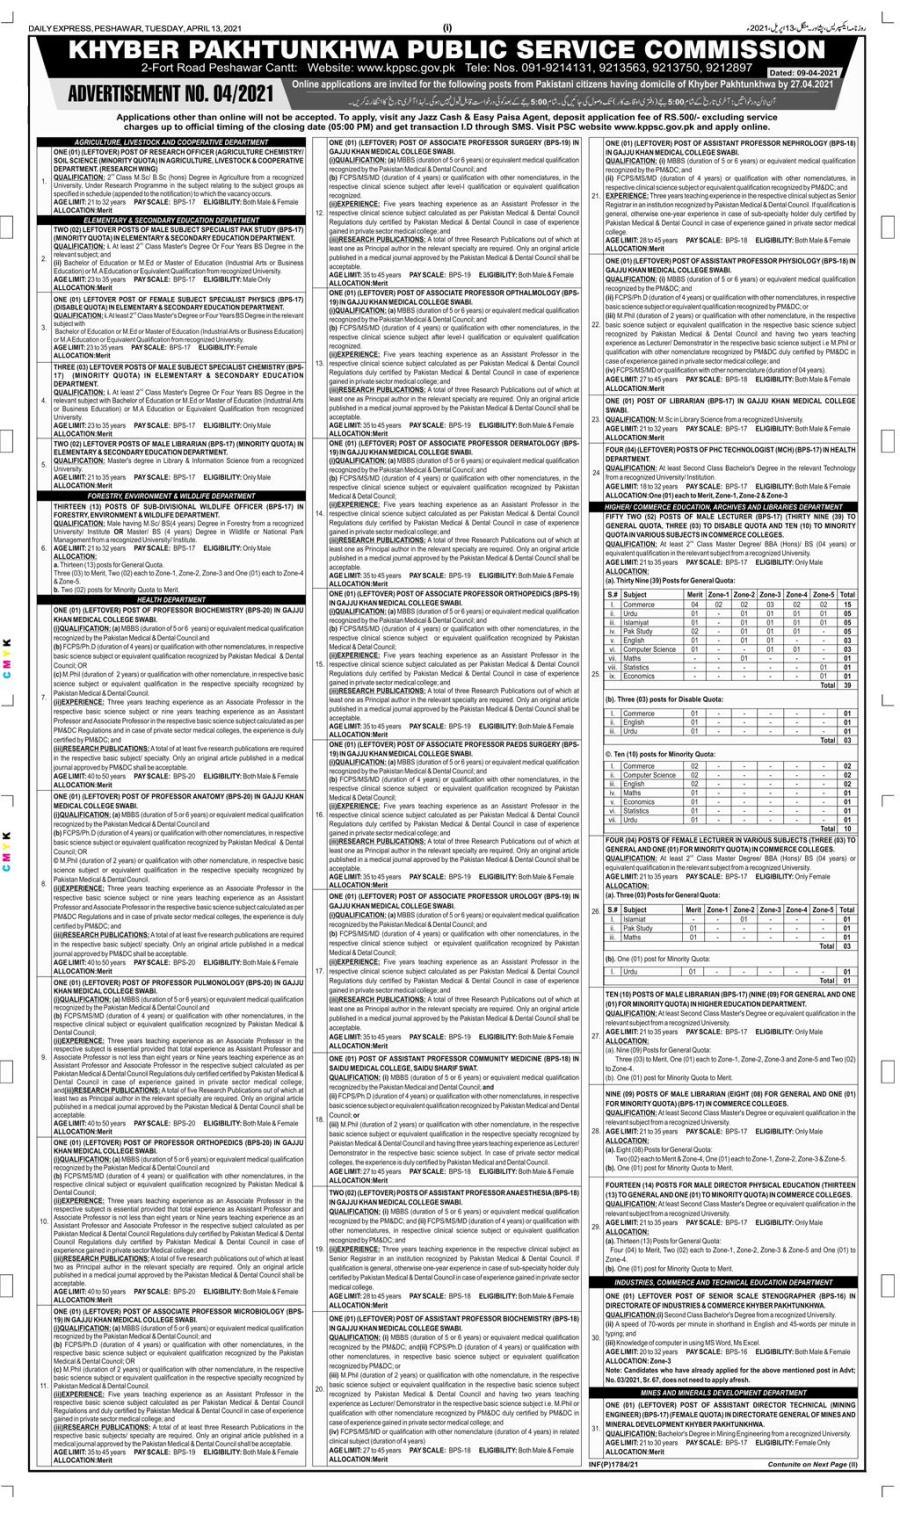 KPPSC Jobs April 2021 Advrts